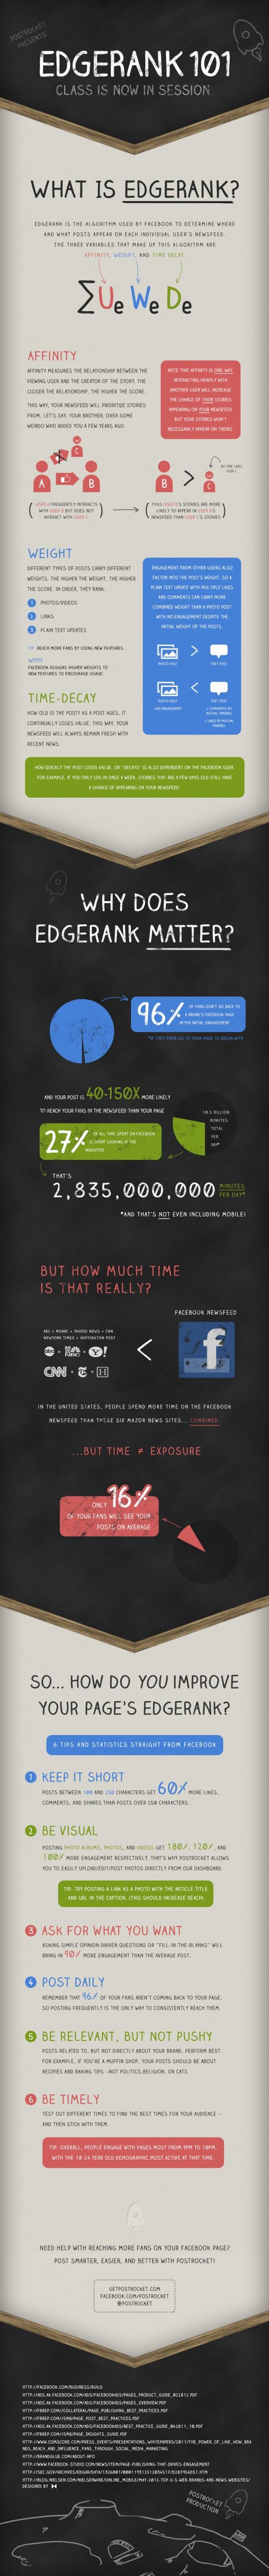 How Edgerank Works-Infographic